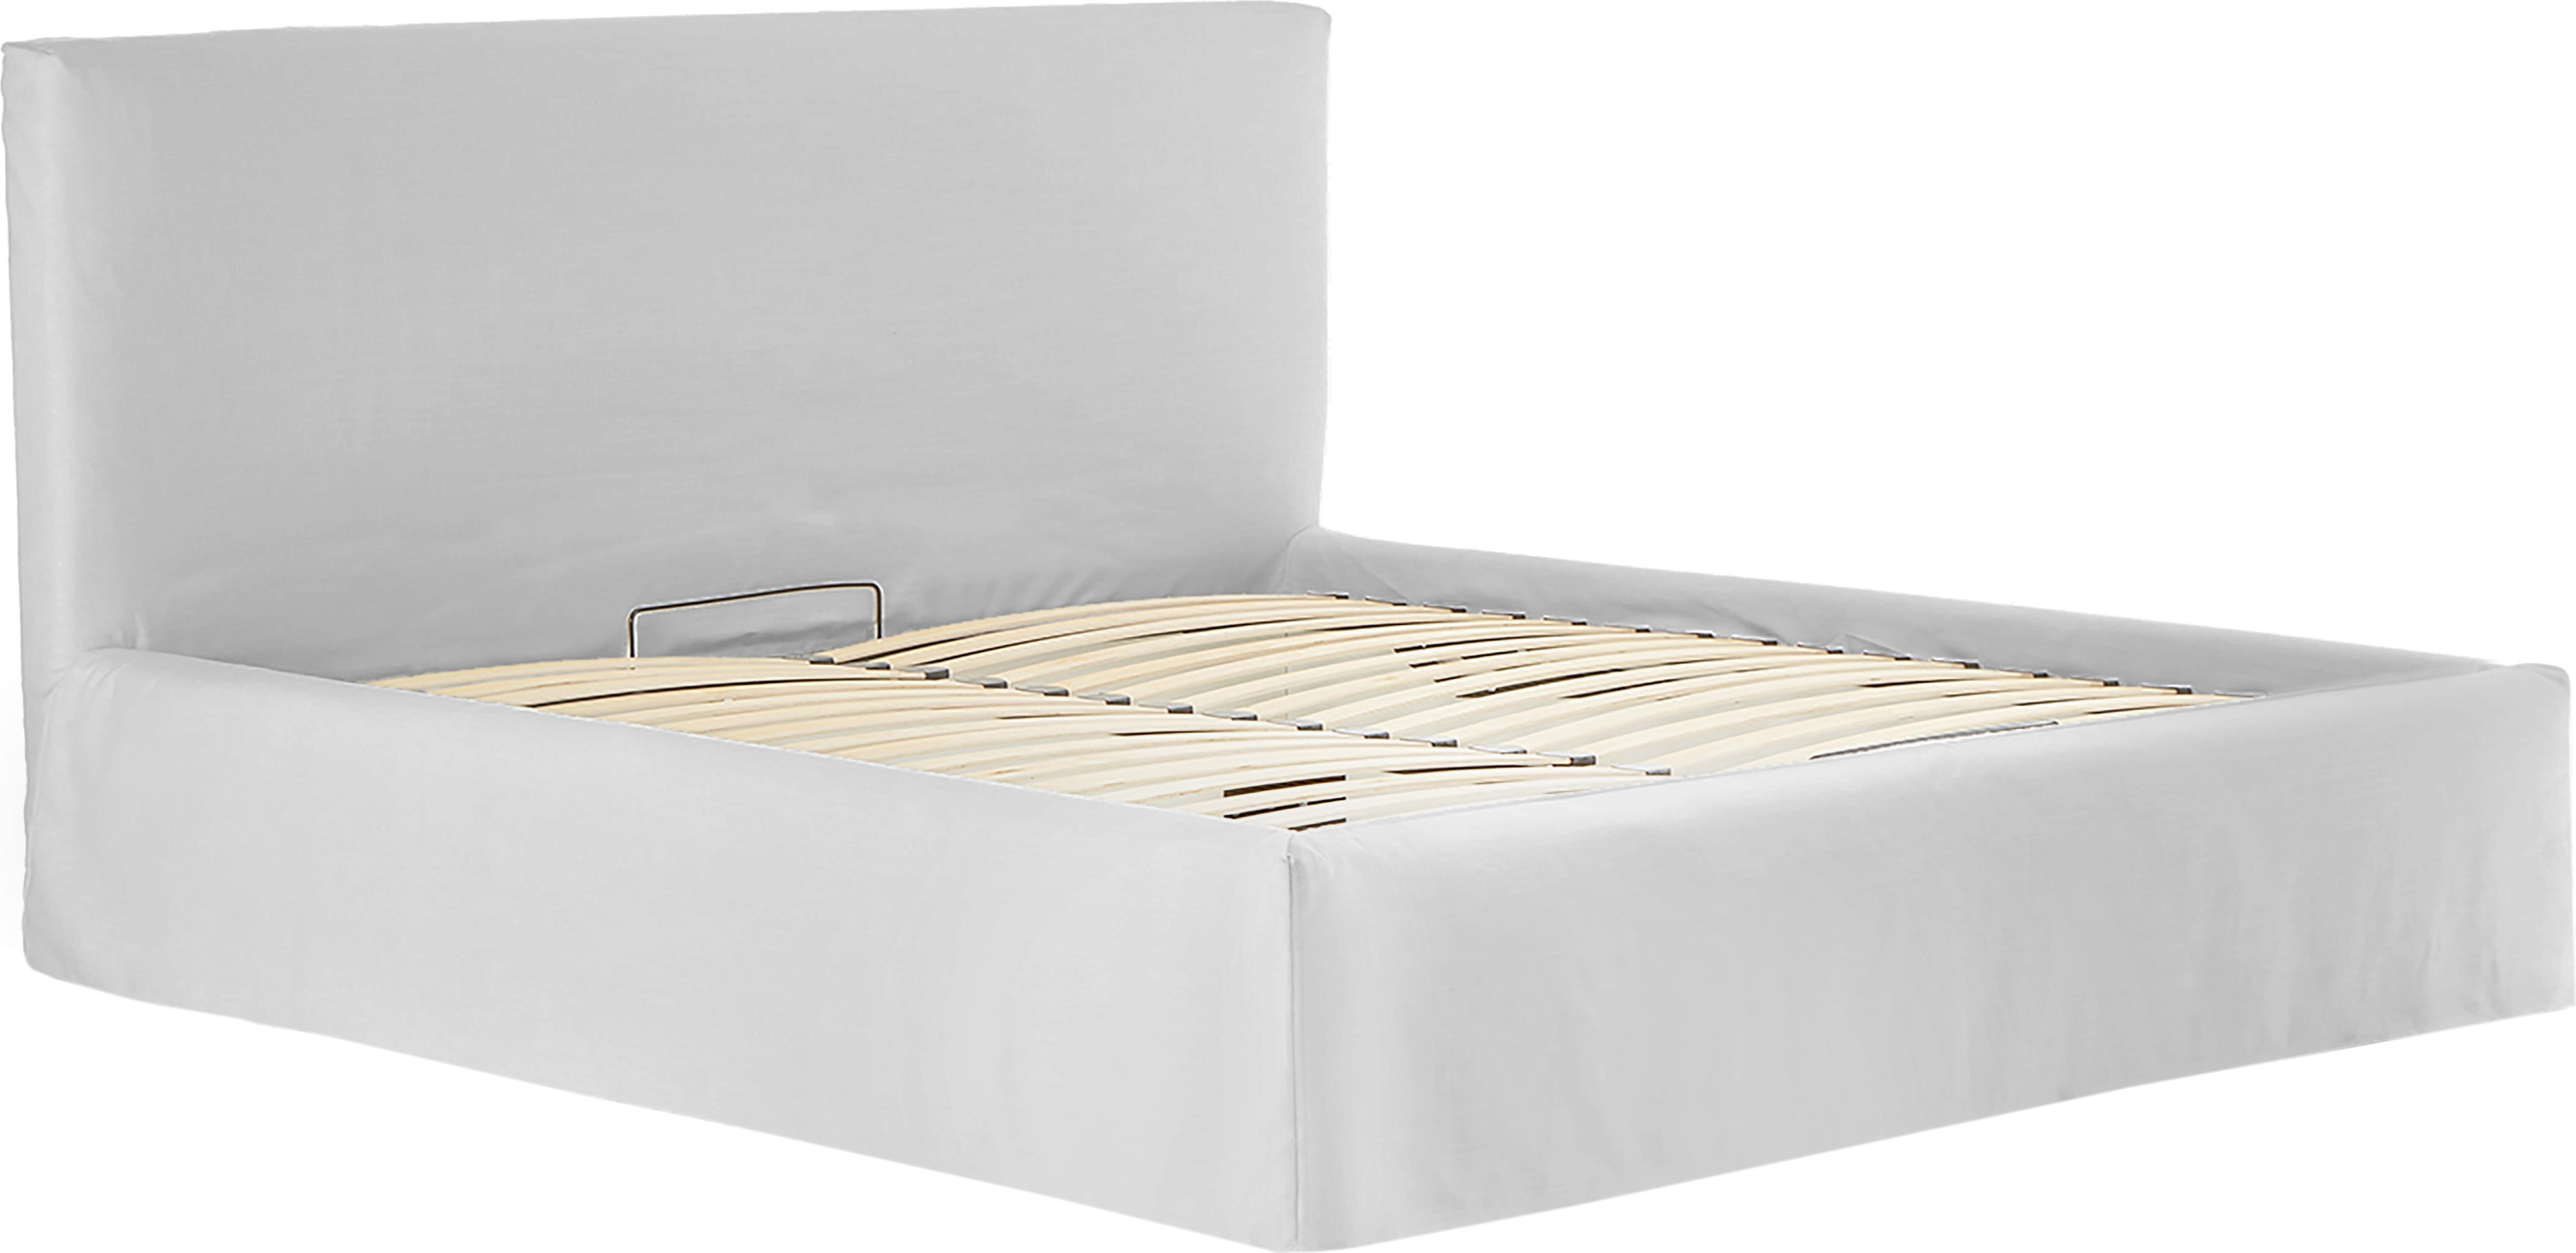 Polsterbett Feather mit Stauraum, Korpus: Massives Kiefernholz, Bezug: Polyester (Strukturstoff), Beigegrau, 160 x 200 cm